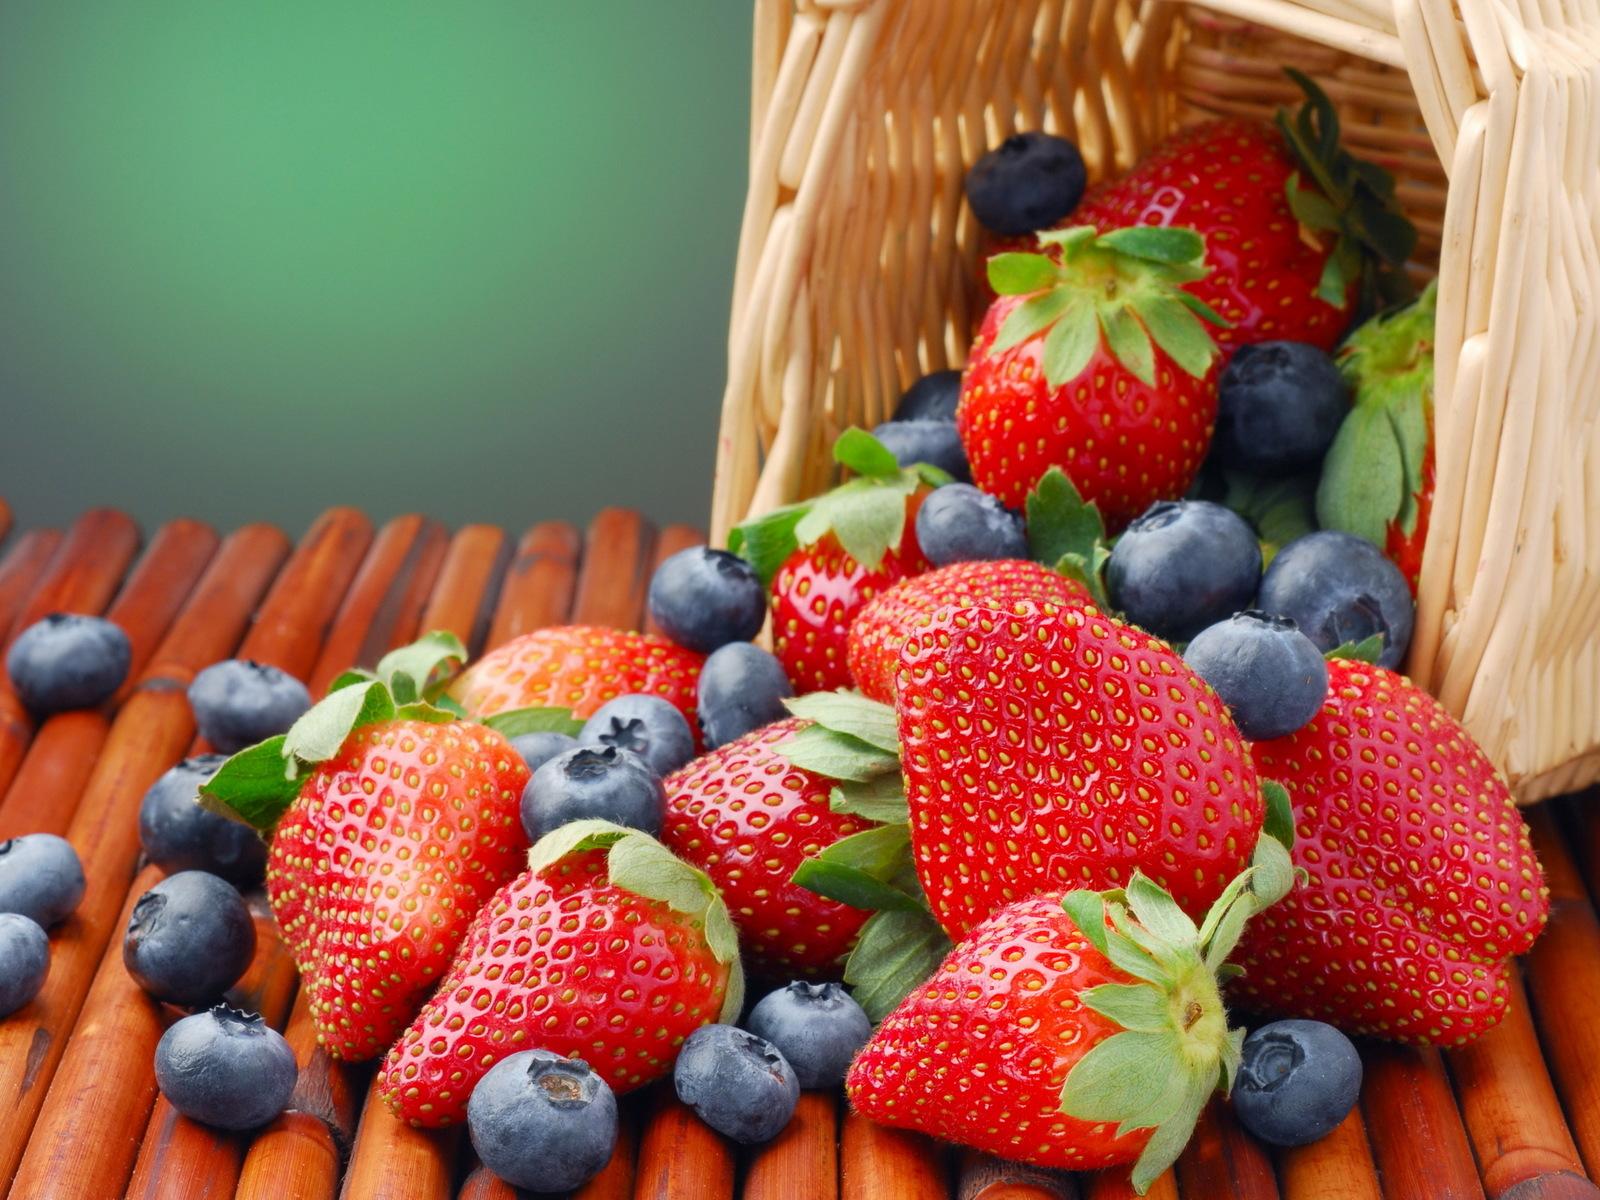 Sweet berries photo